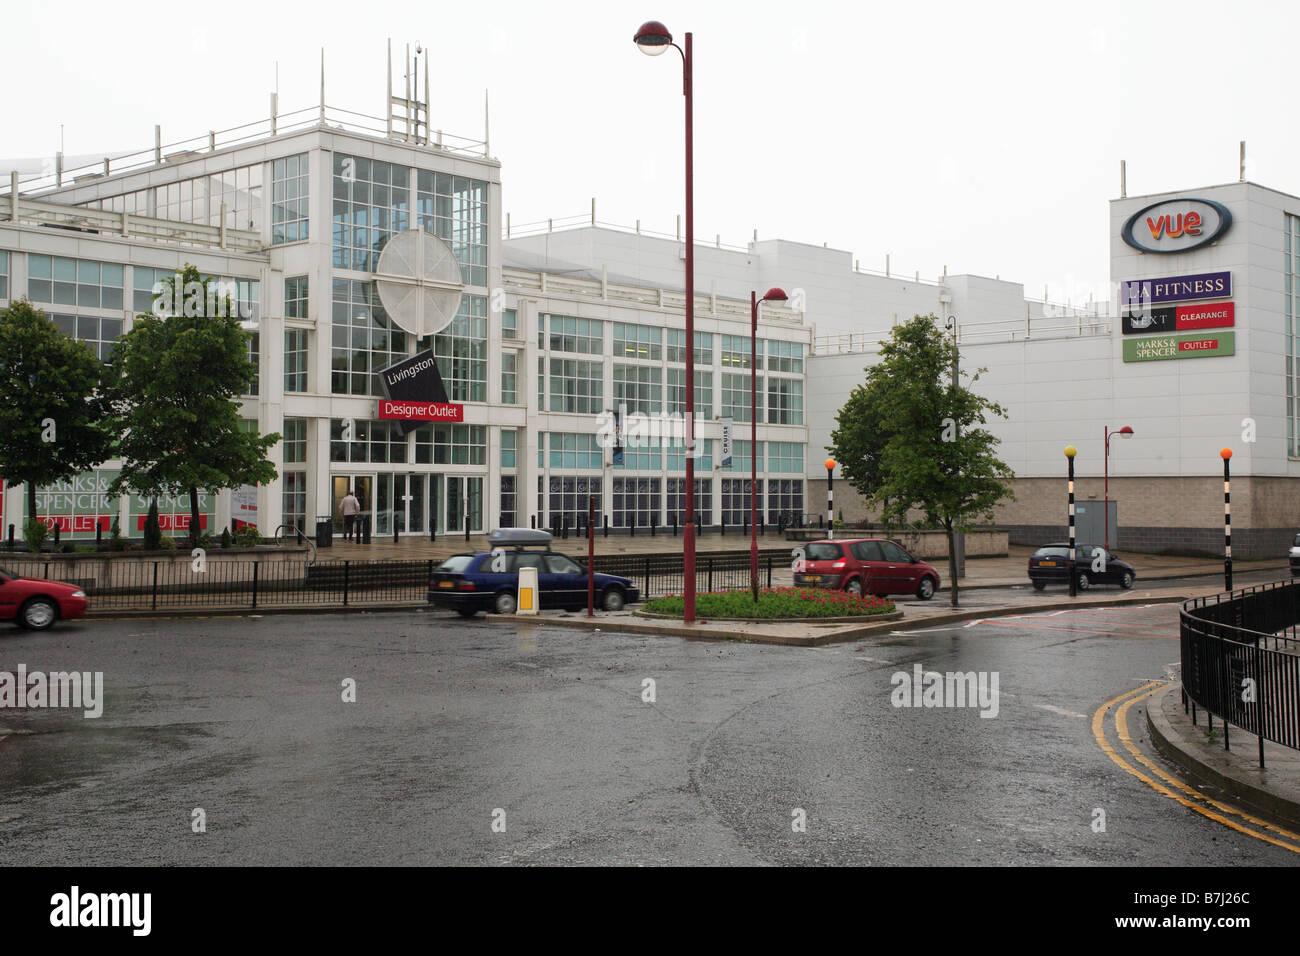 Entrance to the Almondvale Shopping Centre, Livingston, West Lothian. - Stock Image